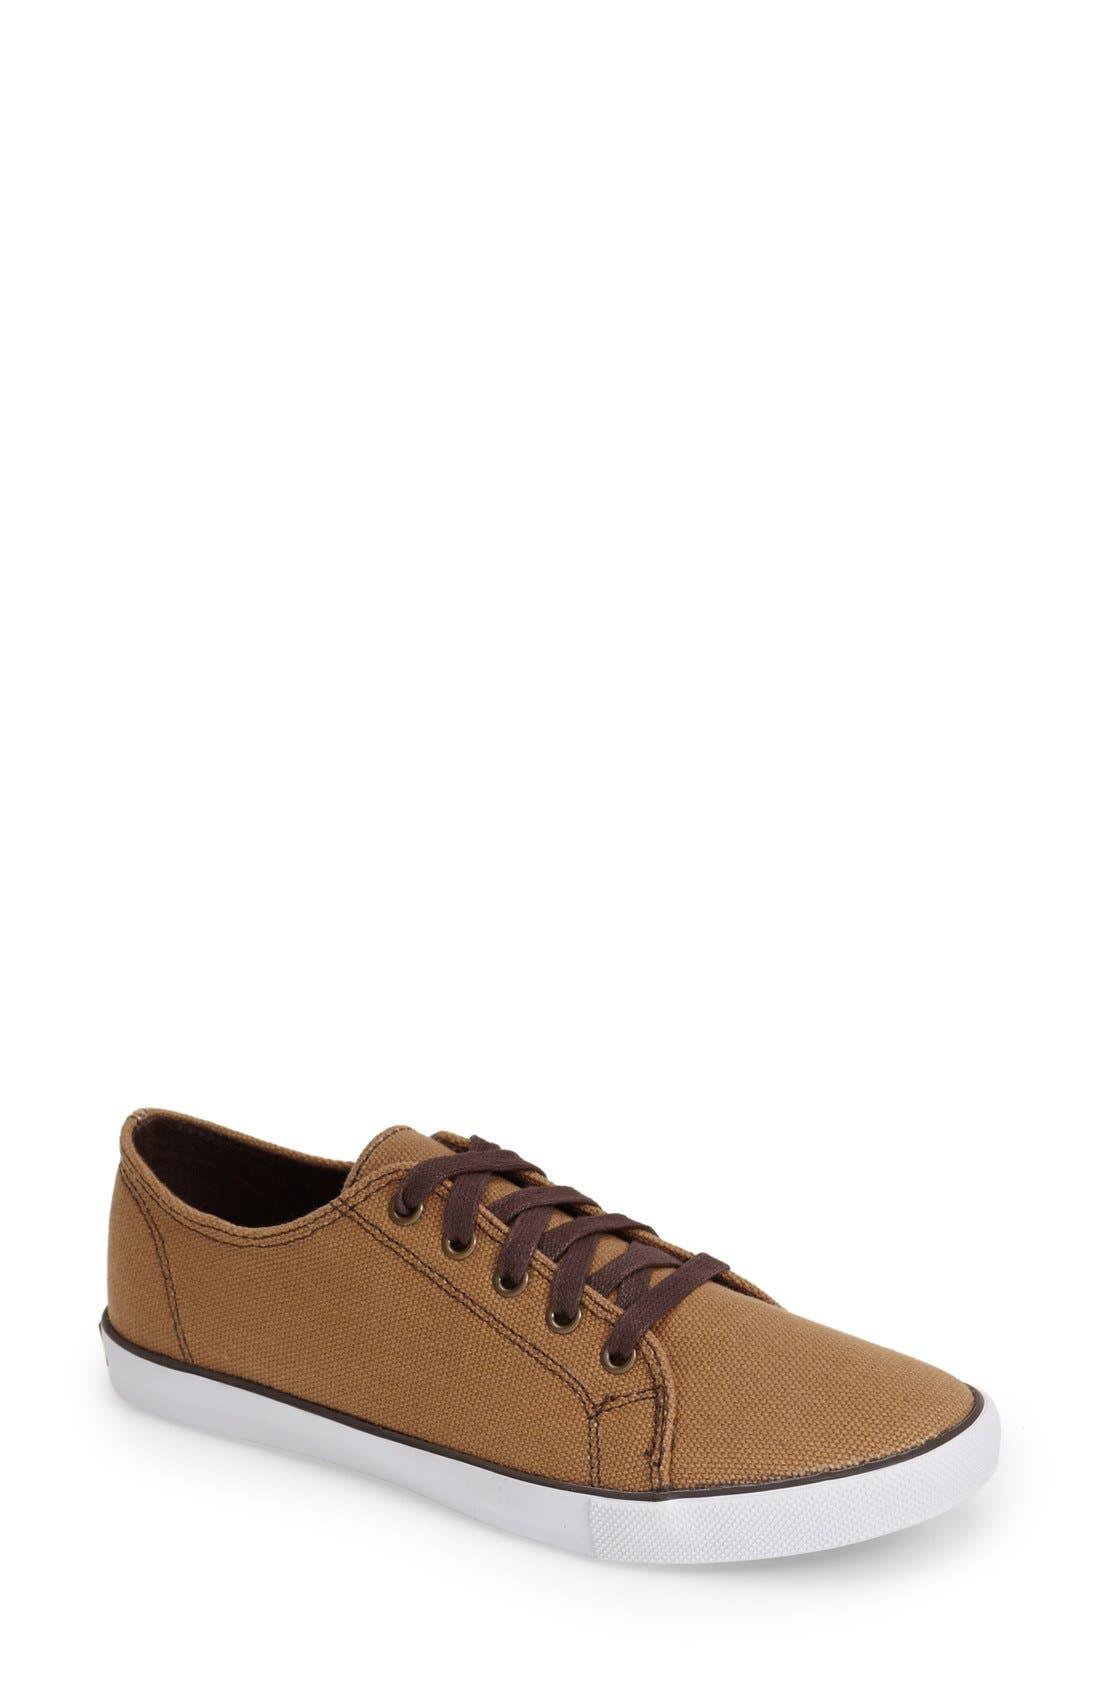 'Strand' Sneaker,                             Main thumbnail 1, color,                             Brush Brown Canvas